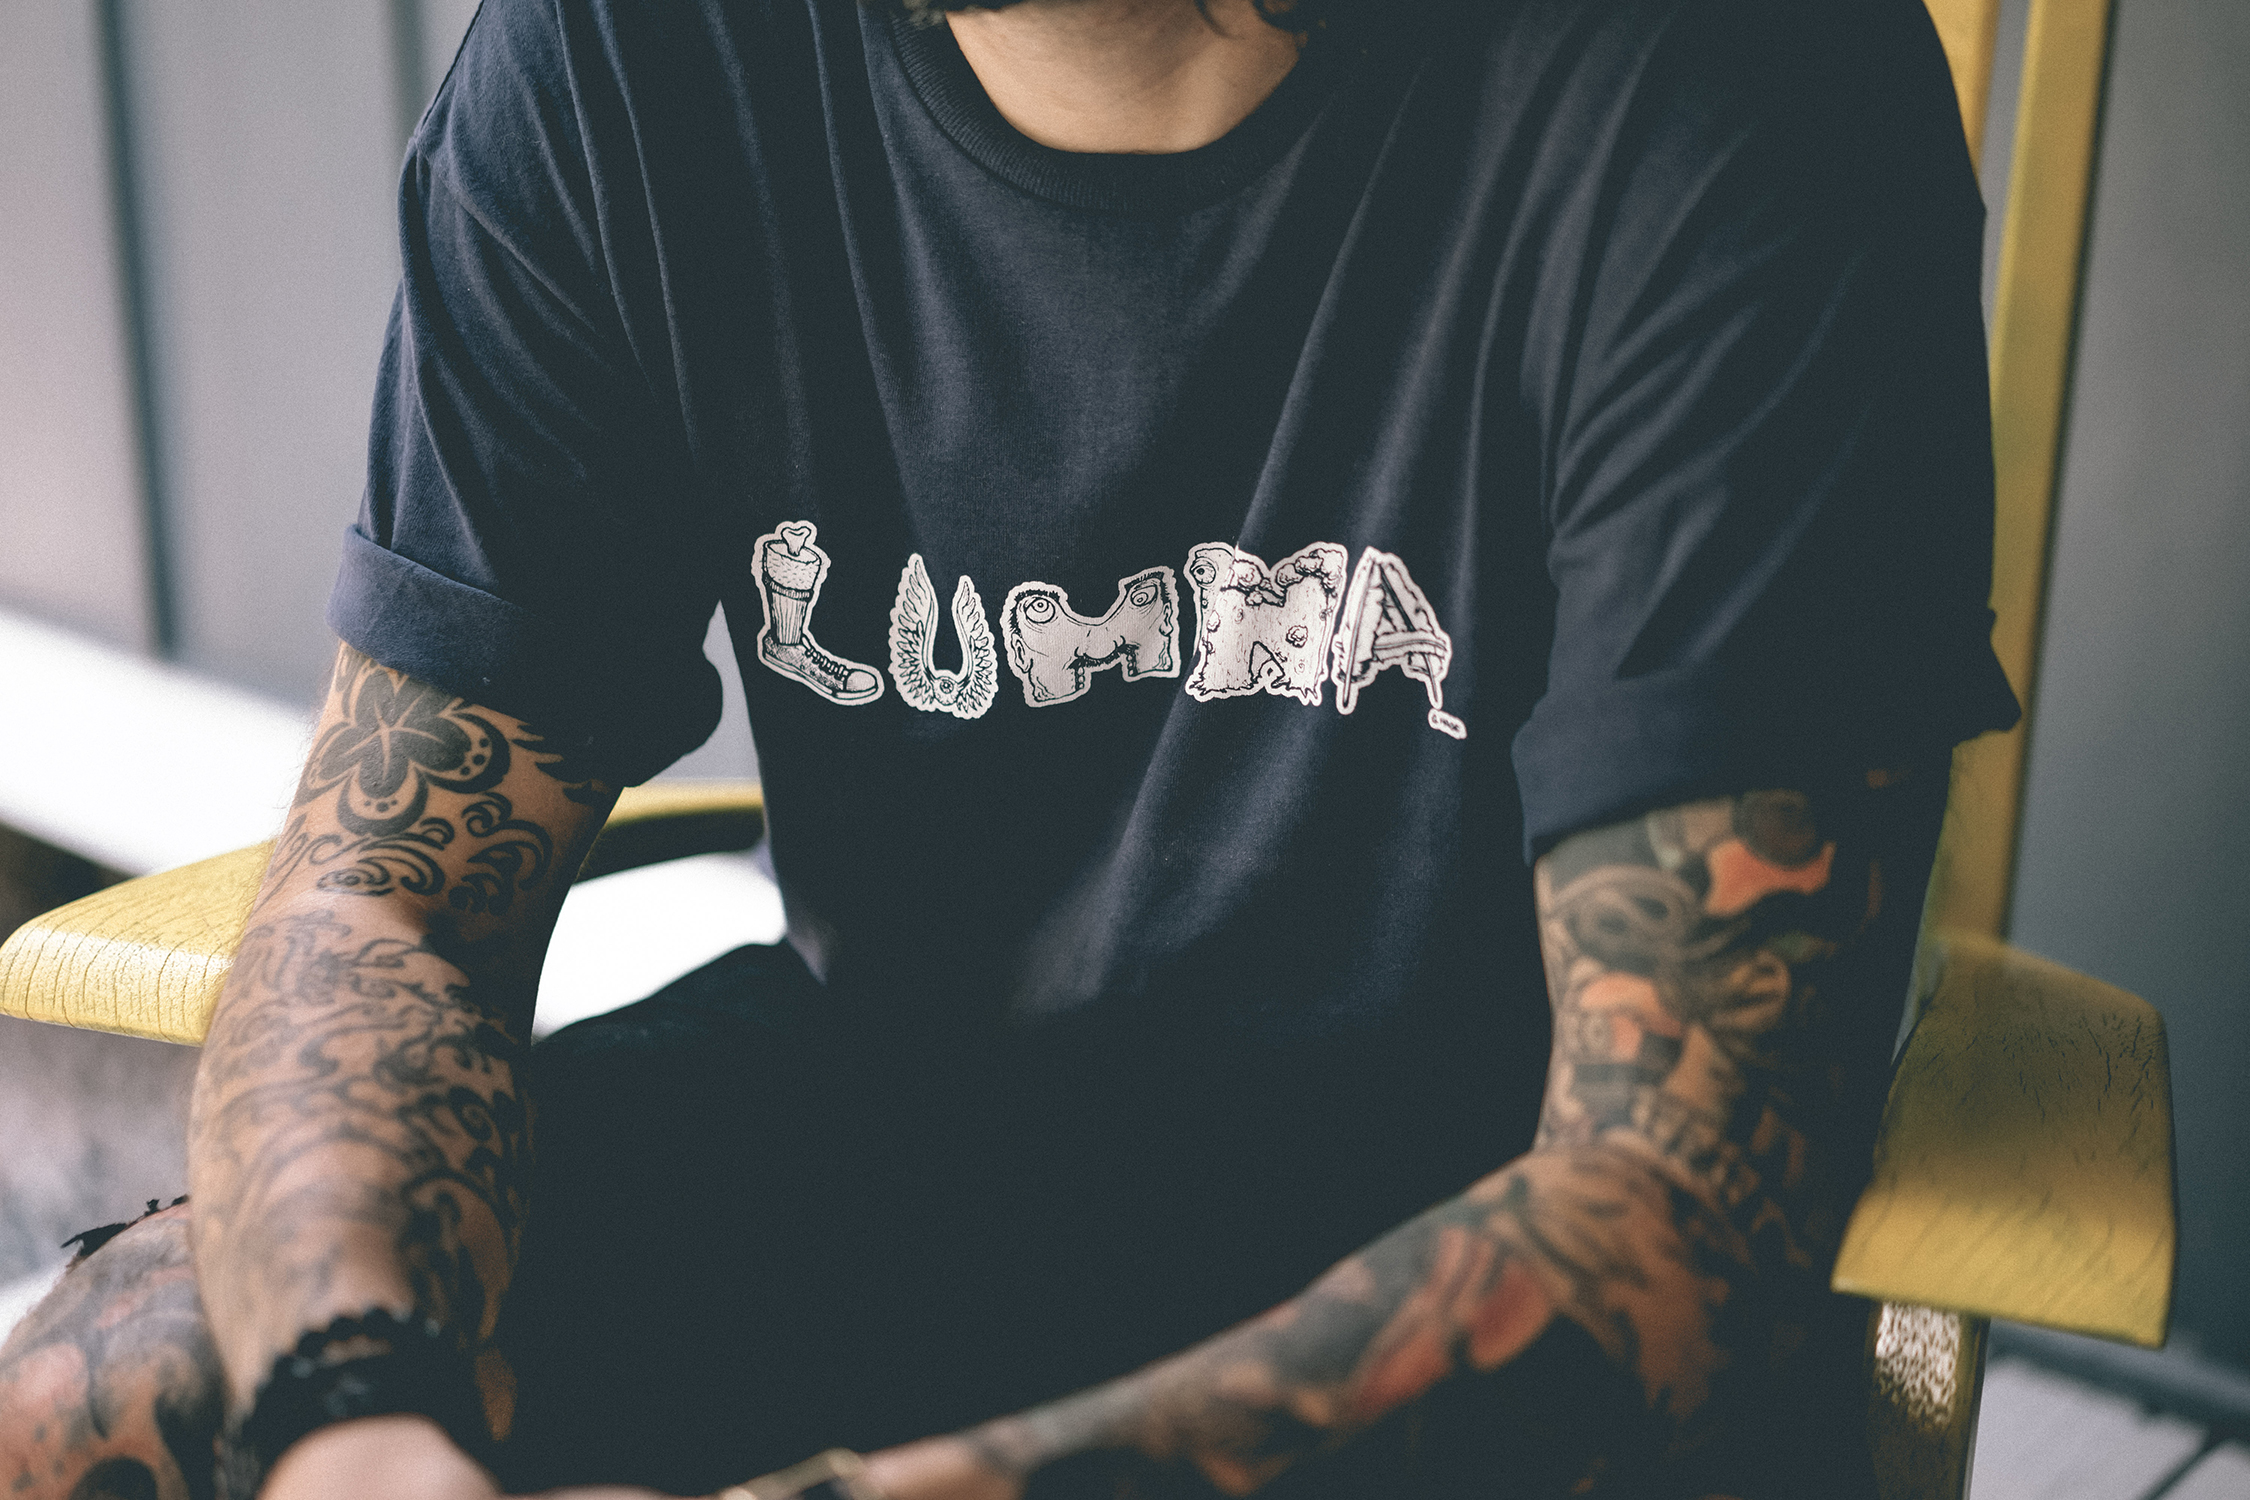 GH_Lumina_JustinMiller2-CloseUp.jpg